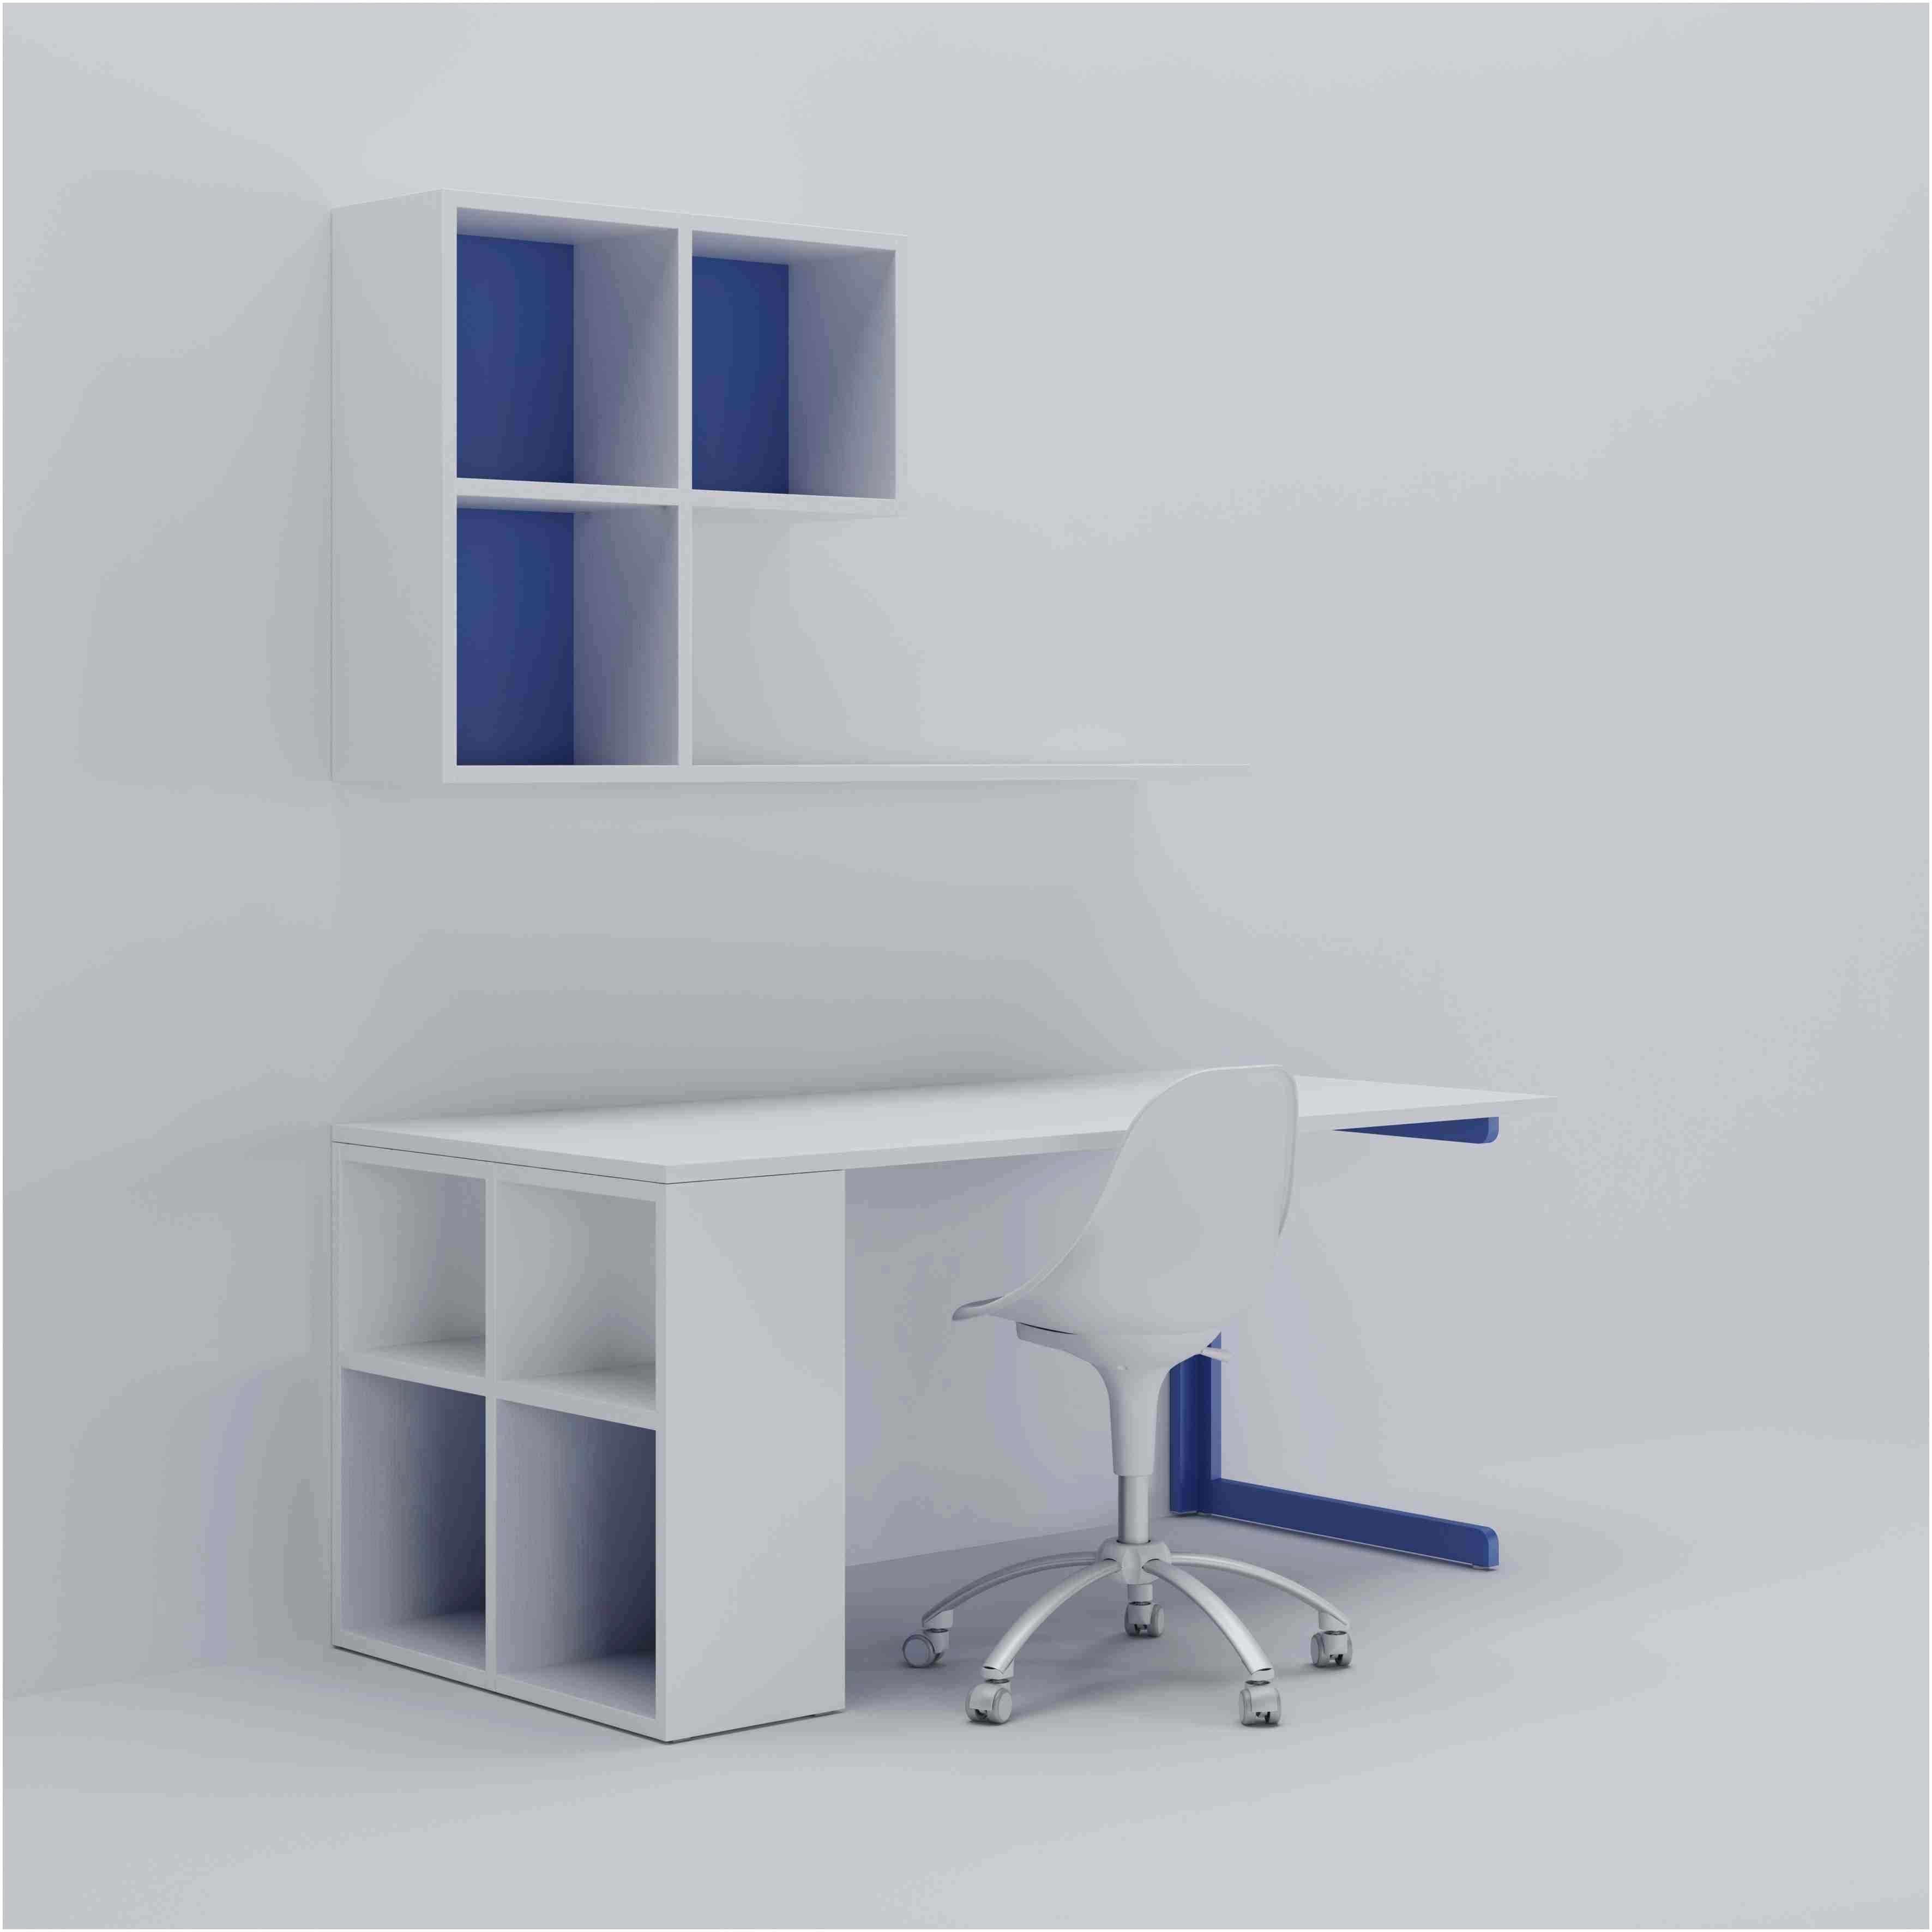 Lit Mezzanine Fille Fraîche Unique Bureau Chambre Ado Ikea New Bureau Ado Ikea Luxe Lit